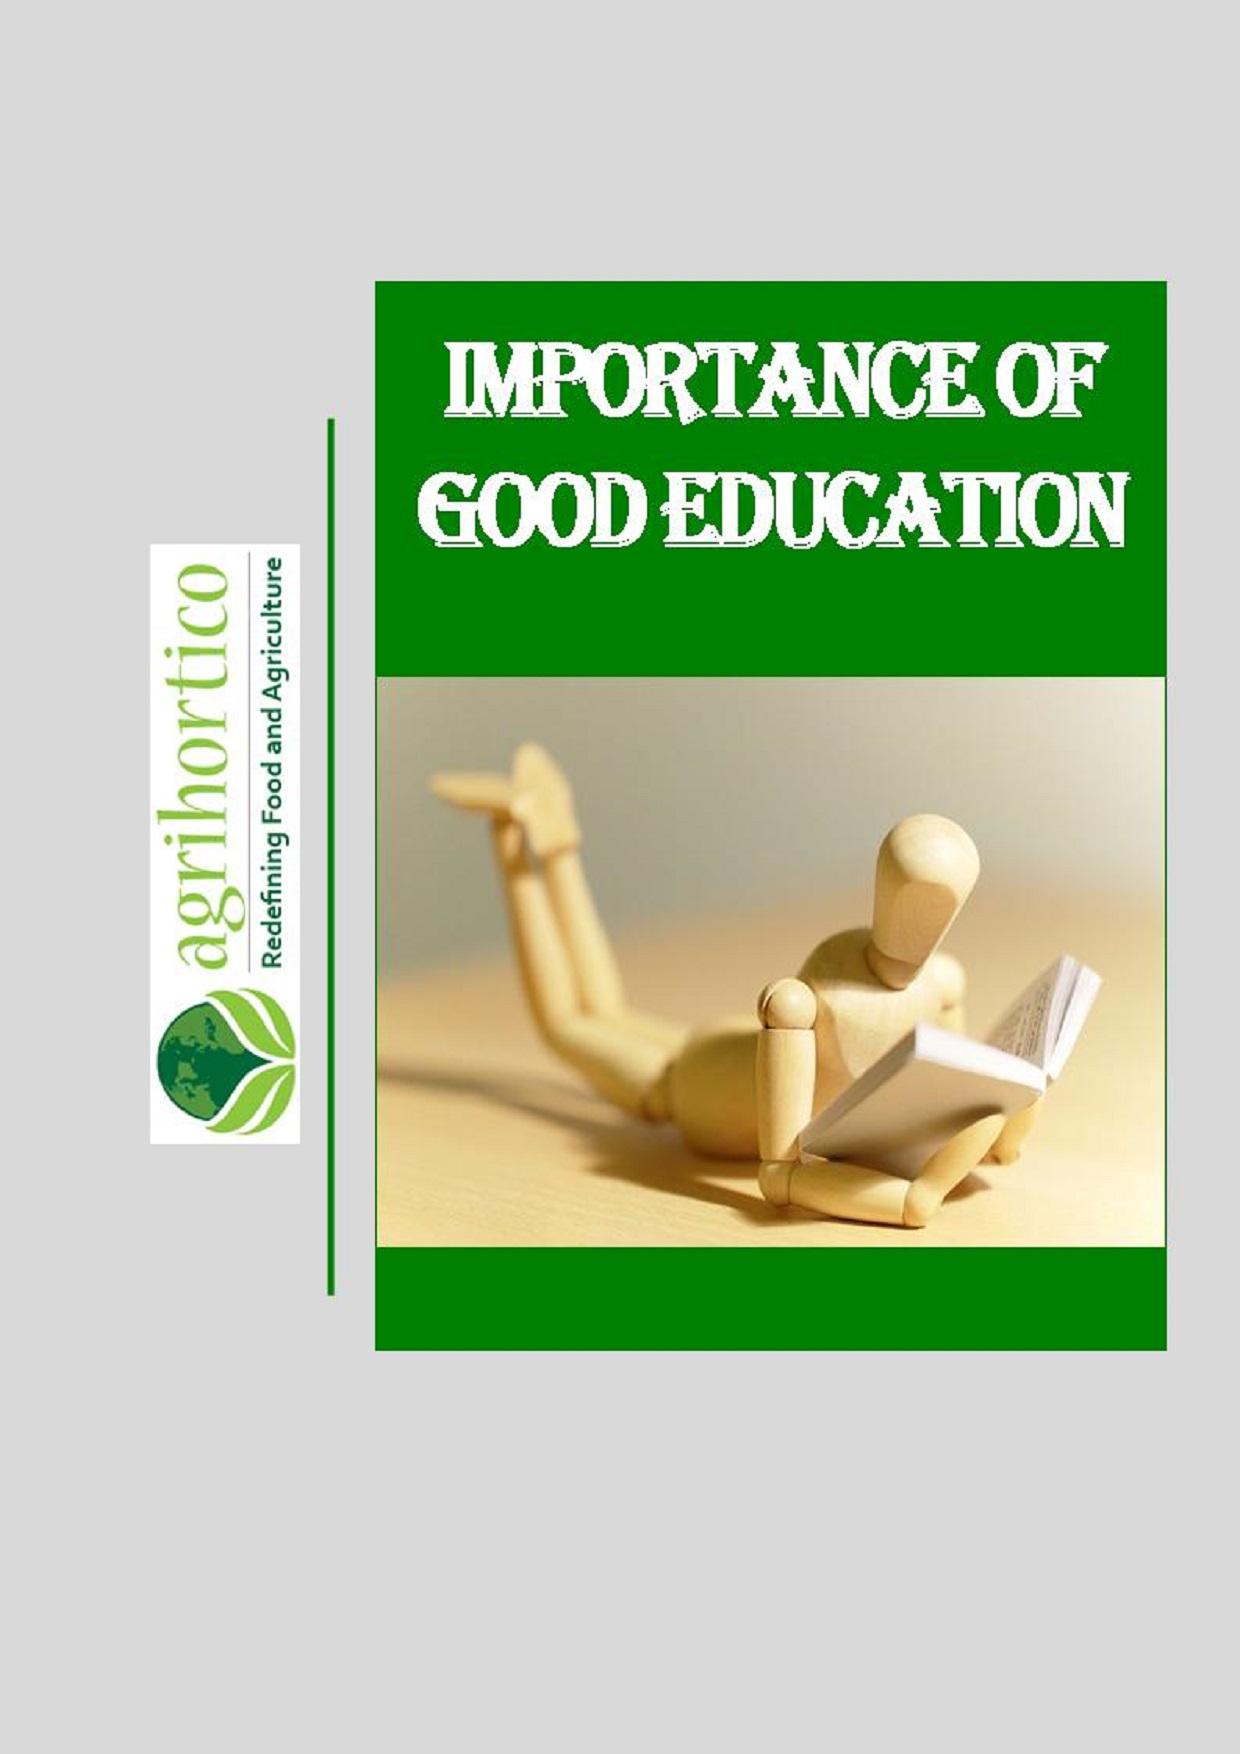 importance-good-education